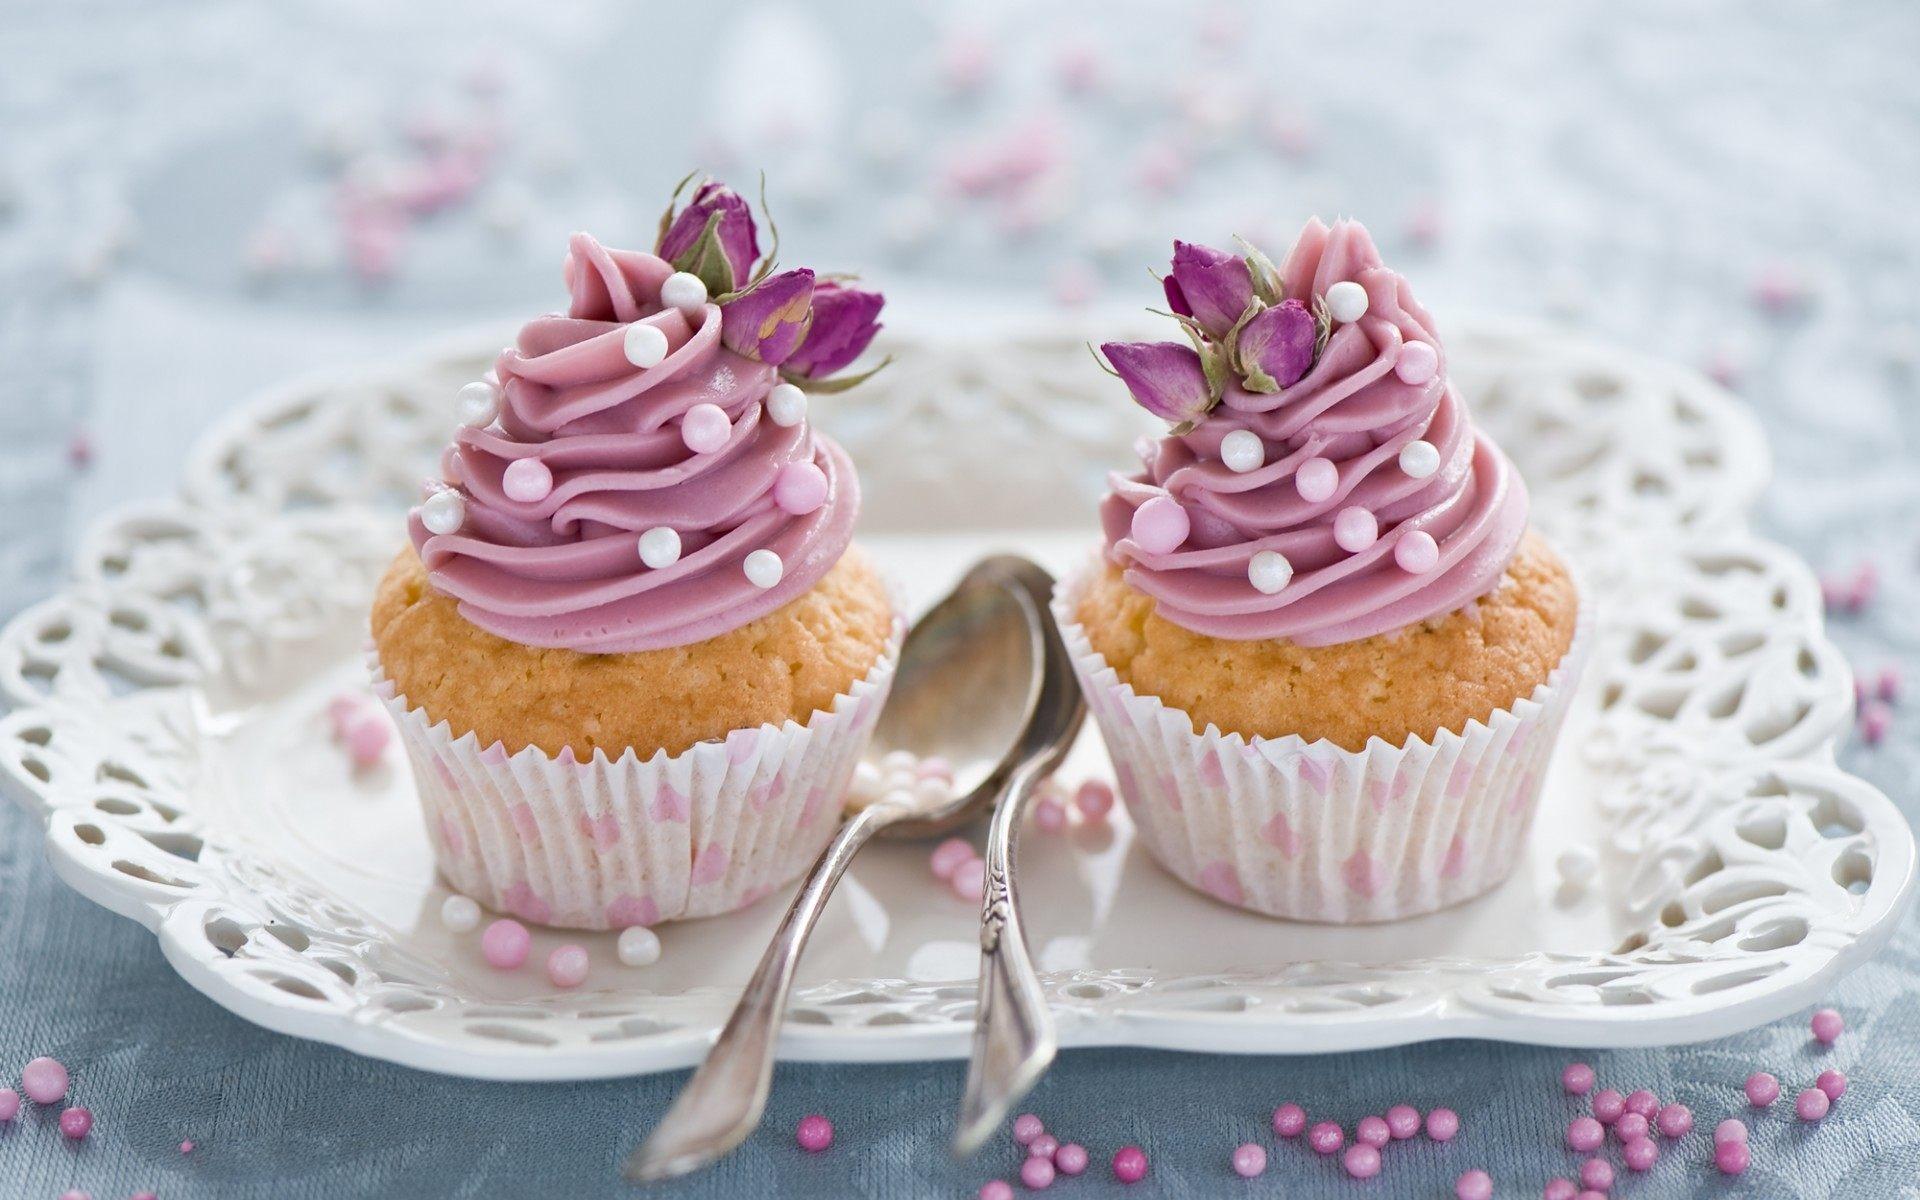 Res: 1920x1200, ...  Rose Cupcakes Wallpaper HD Desktop Background